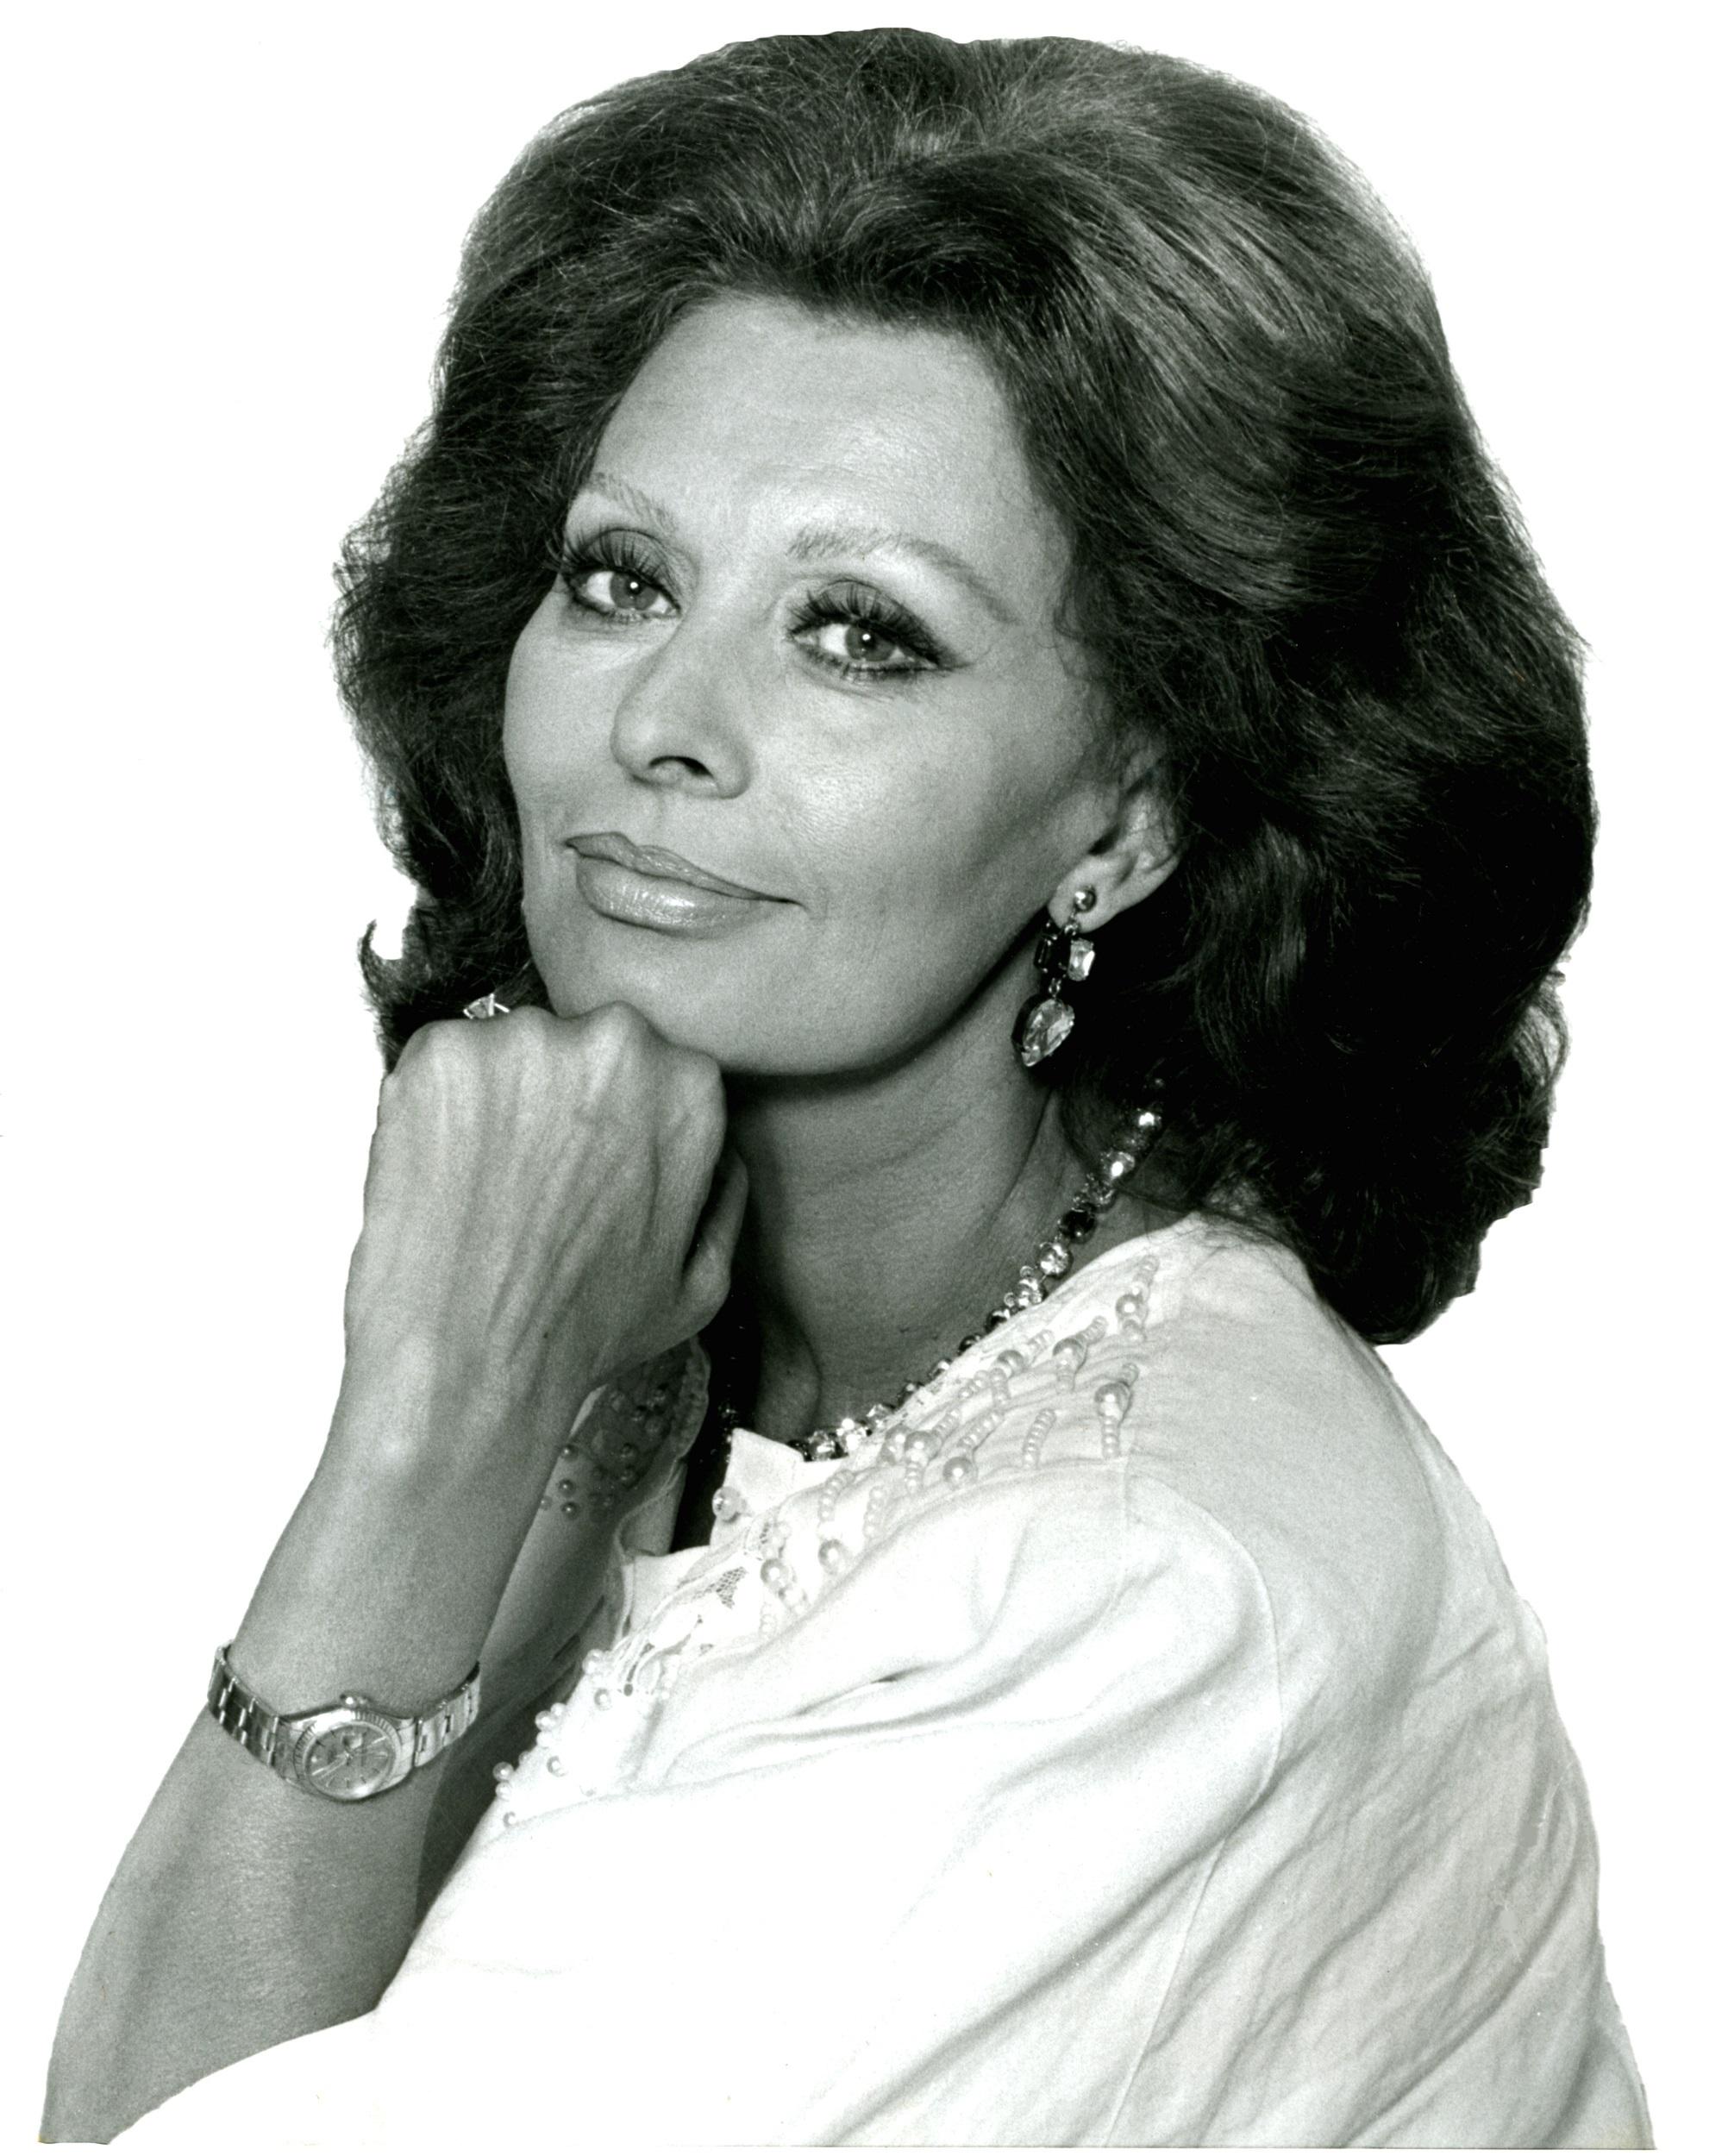 Sophia Loren, Actress, Black, Face, Famous, HQ Photo